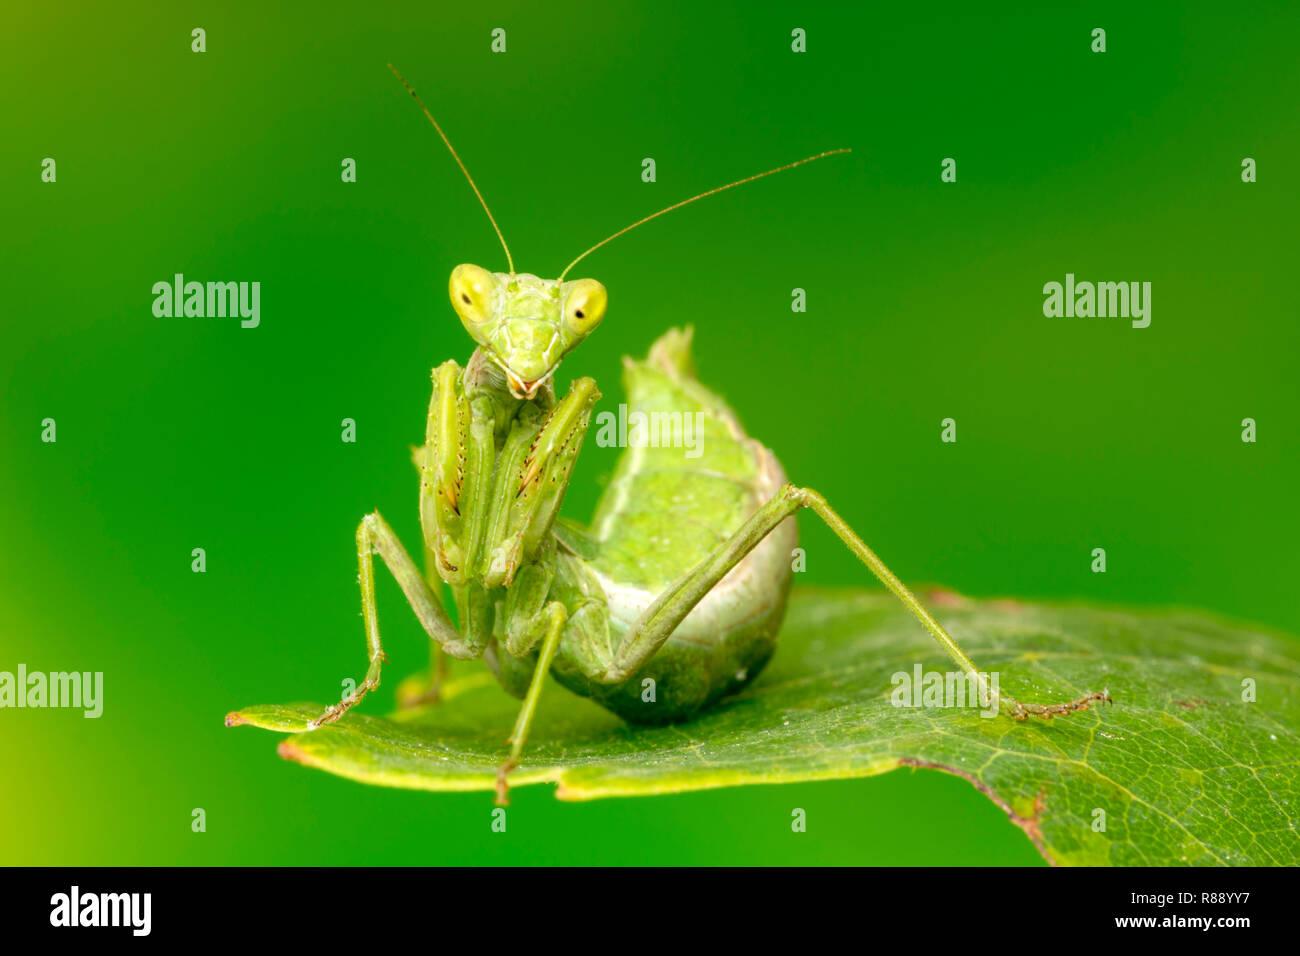 Tiny Wingless praying mantis, adult, life-size magnification - Stock Image